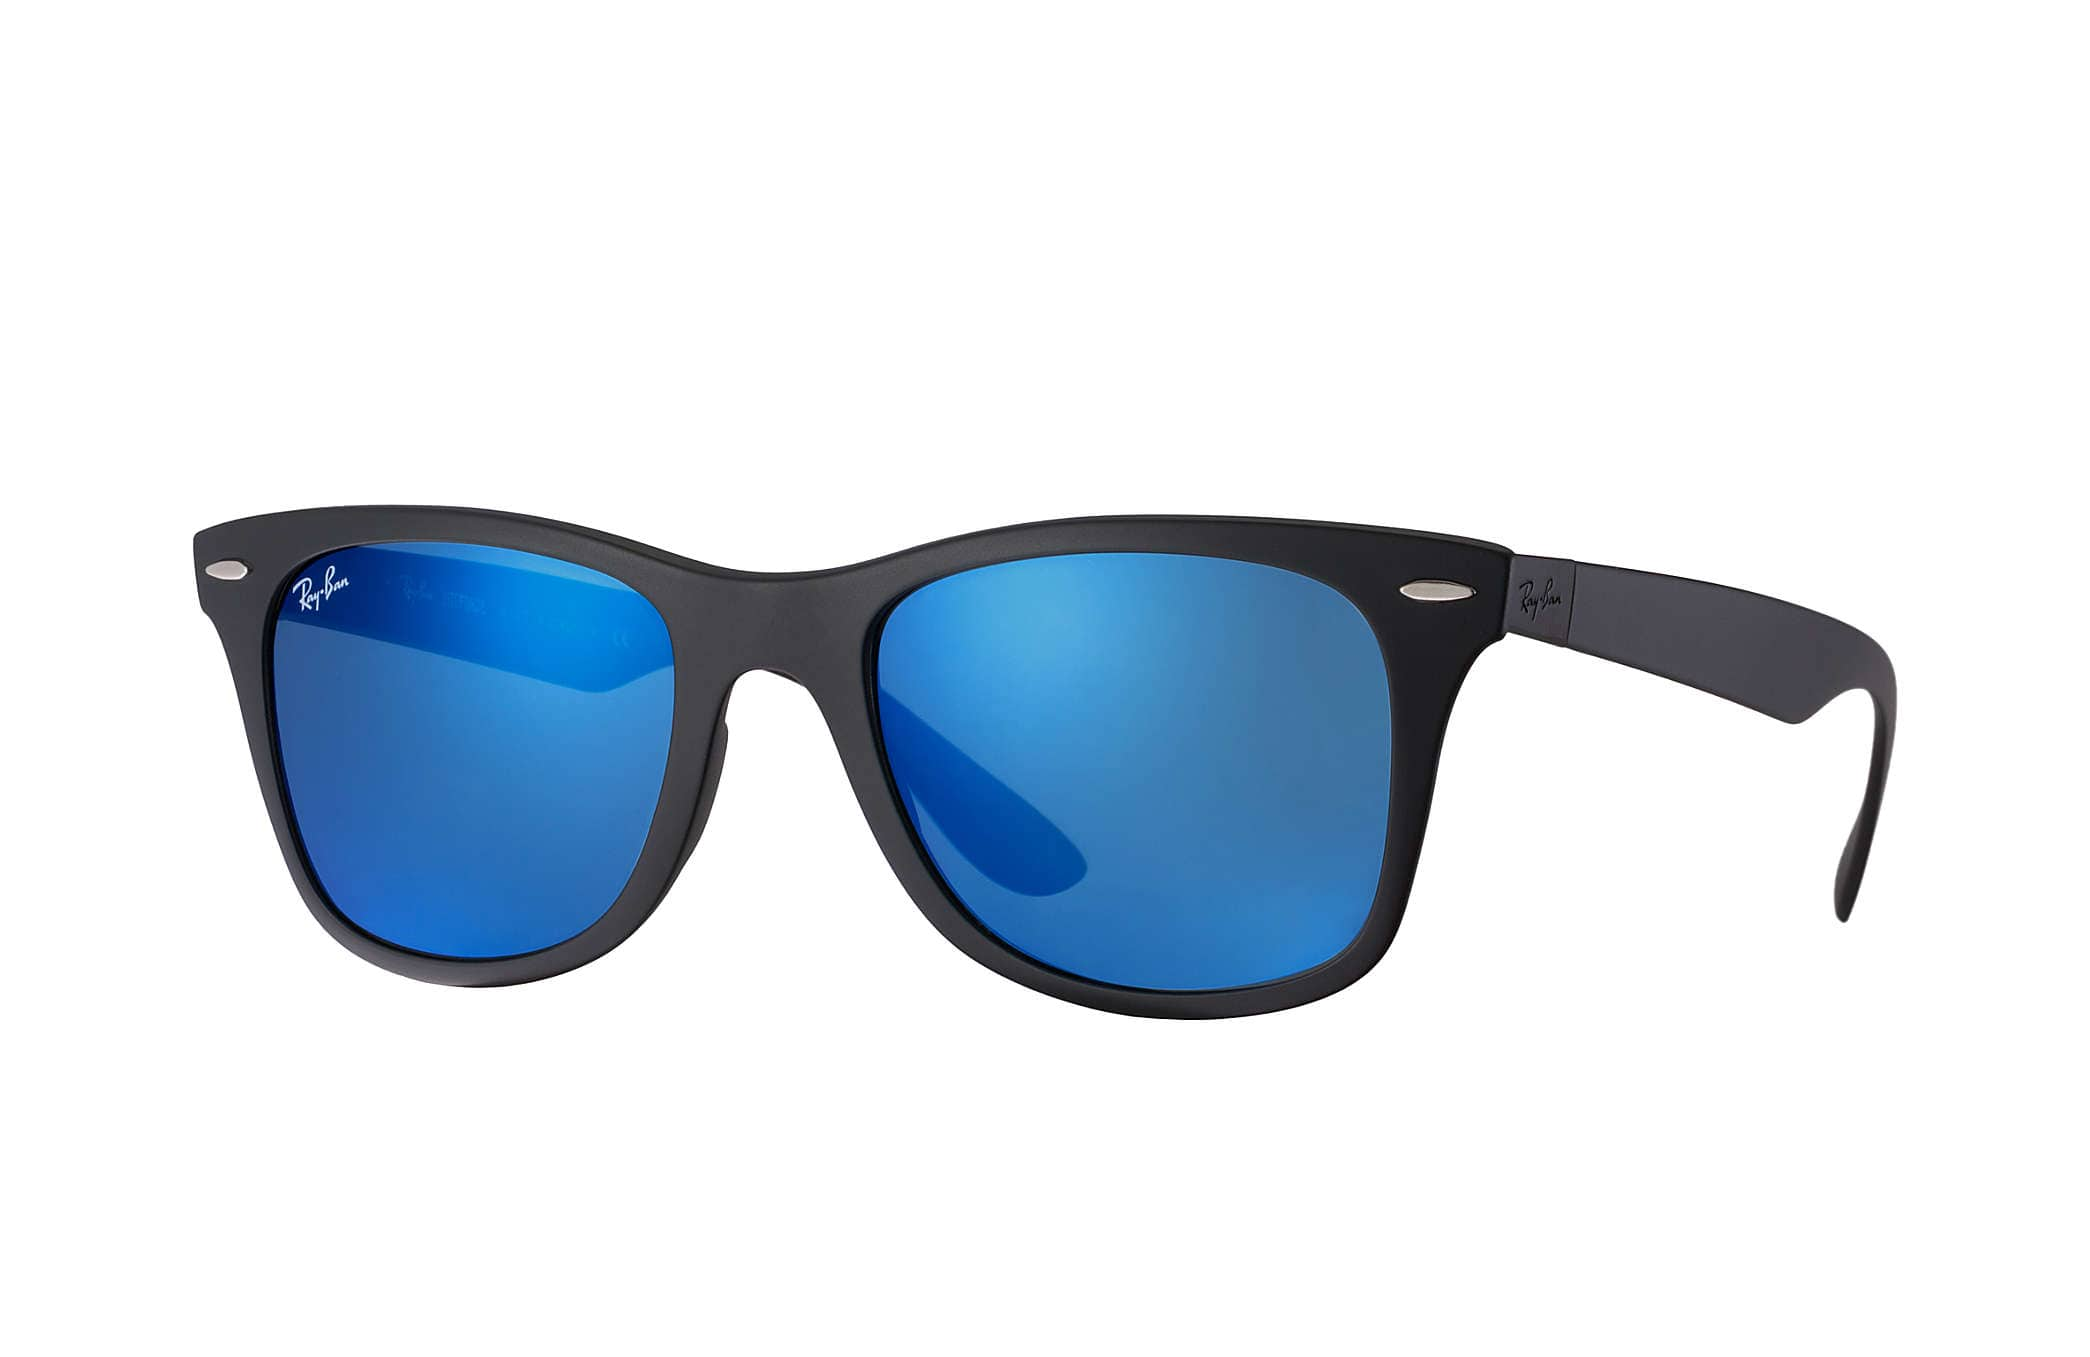 4de1b5cc66 Ray-Ban Sunglasses  Select Men s   Women s Styles - Slickdeals.net